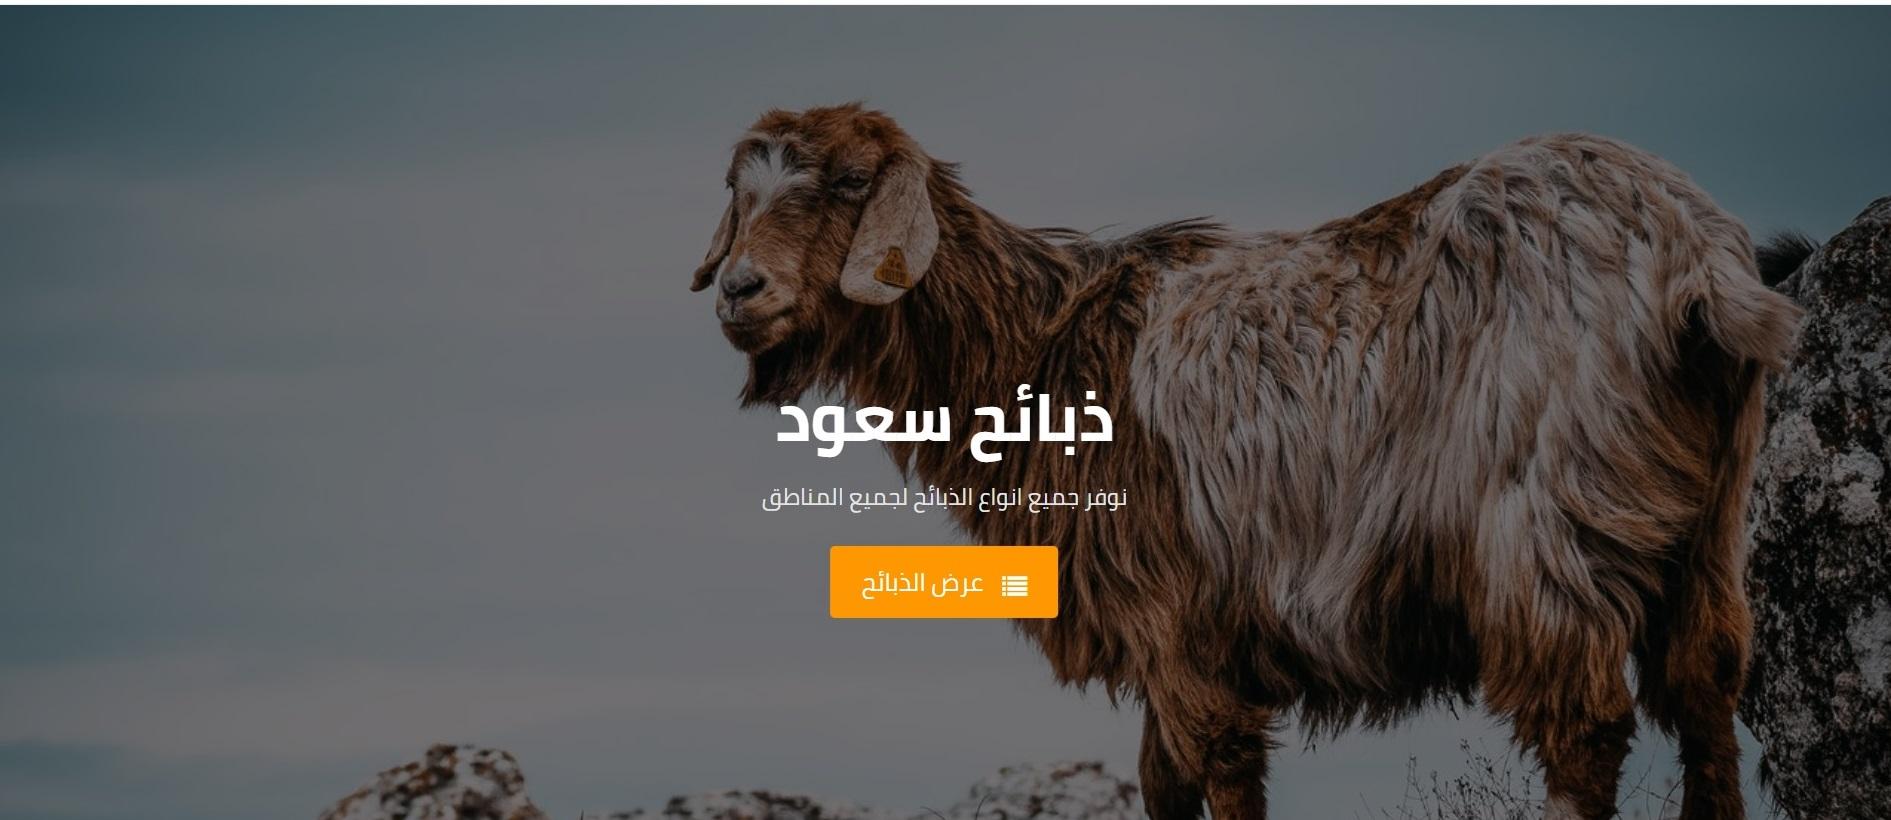 Zabayah Saud | Sheeps Online Store WP